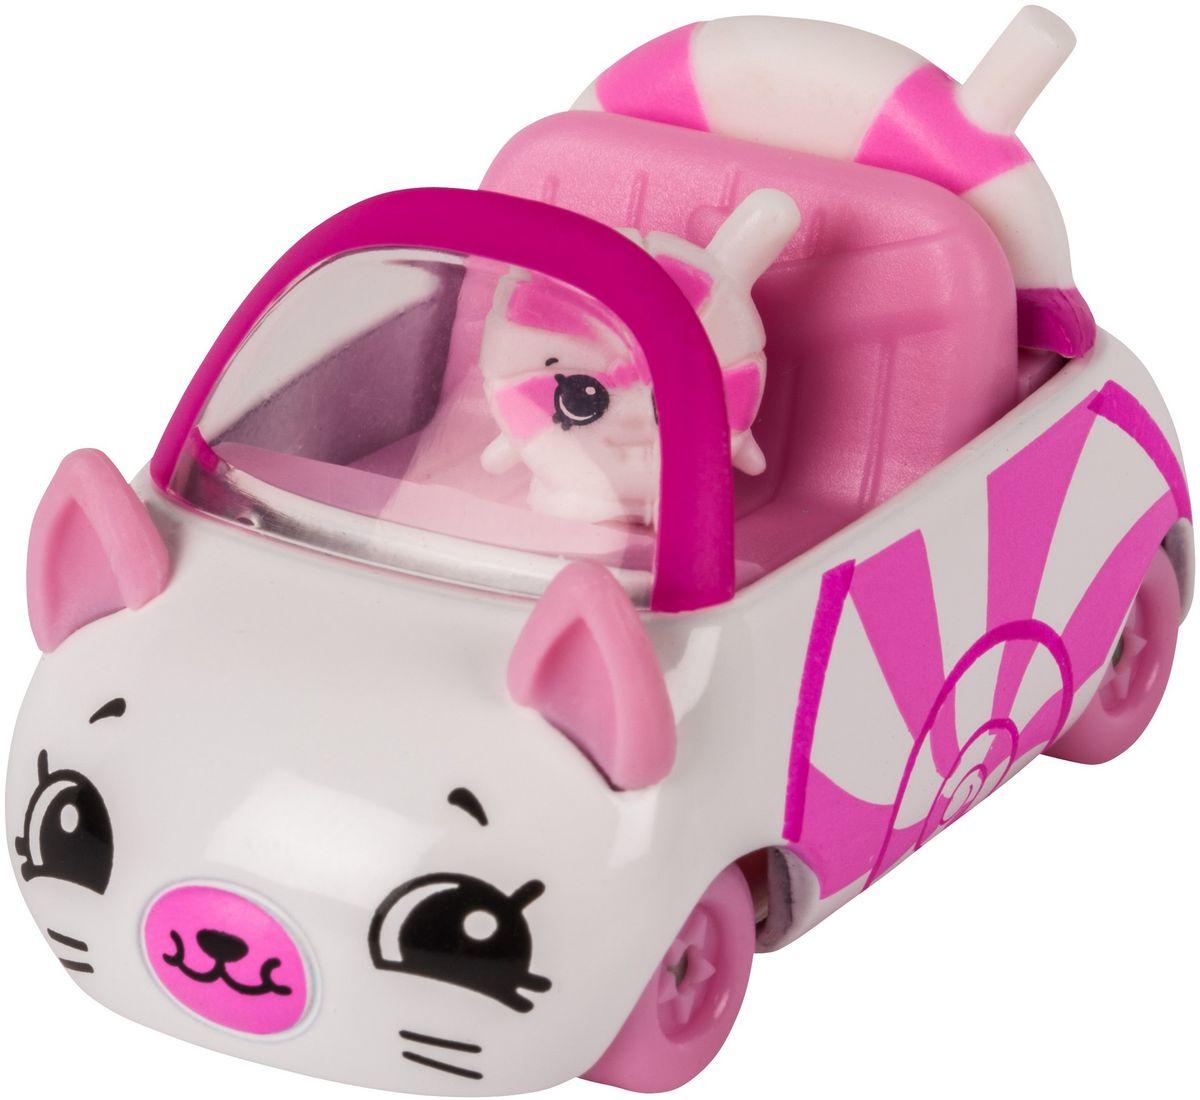 Moose Игровой набор Cutie Car с мини-фигуркой Shopkins S1 56577/ast56742 moose брелок poppy corn shopkins